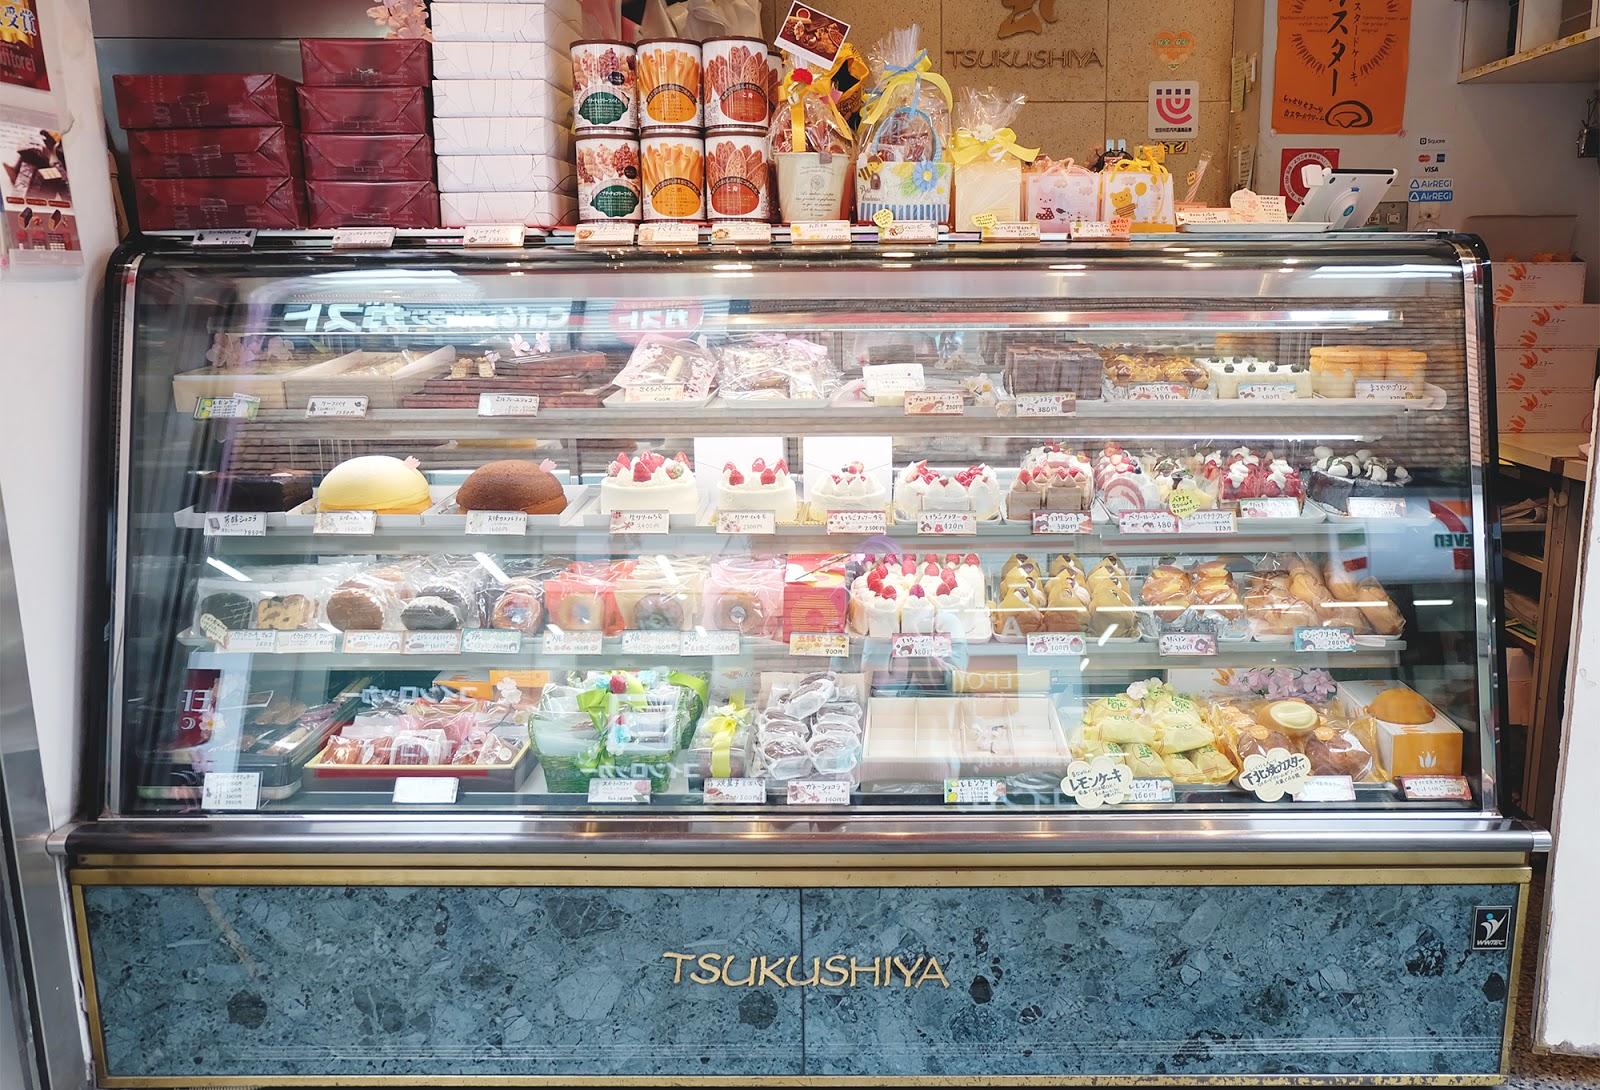 Cake Front Store in Shimokitazawa | www.bigdreamerblog.com